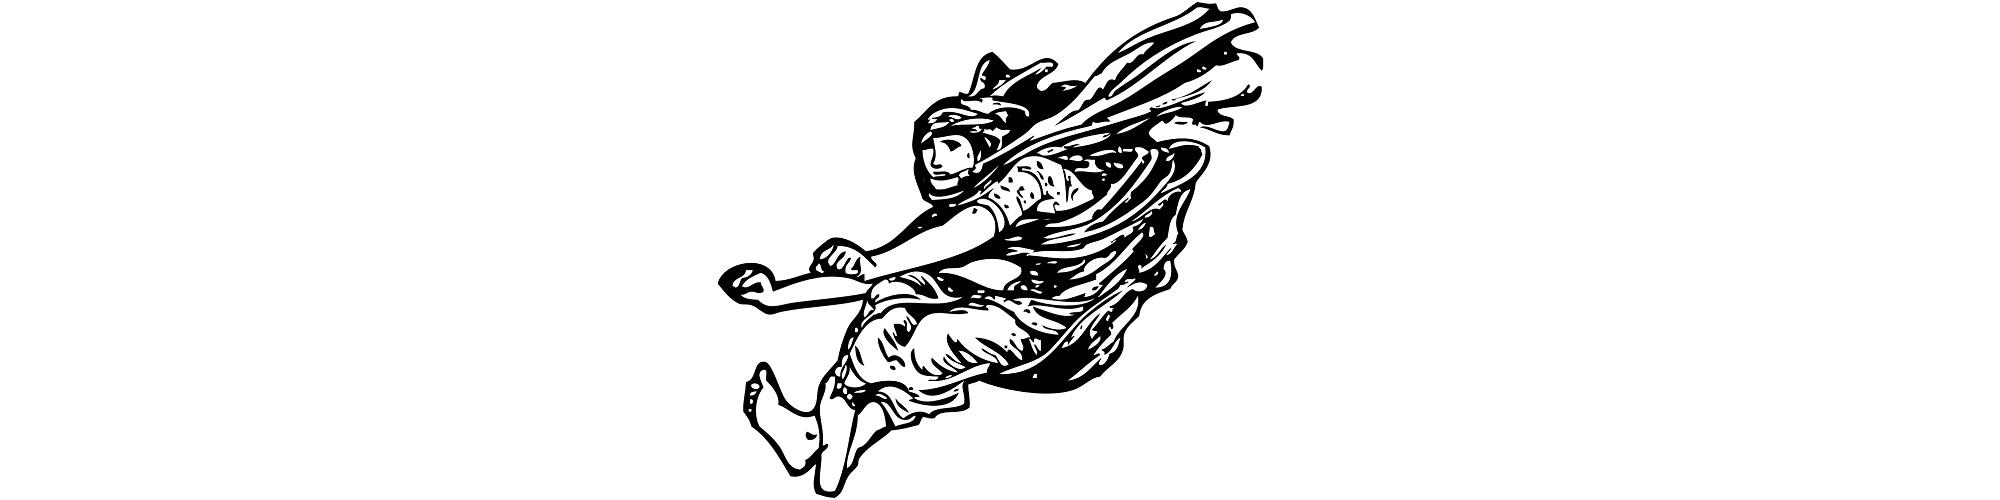 "Illustration of man jumping - ""The Big Jump"" flash fiction"